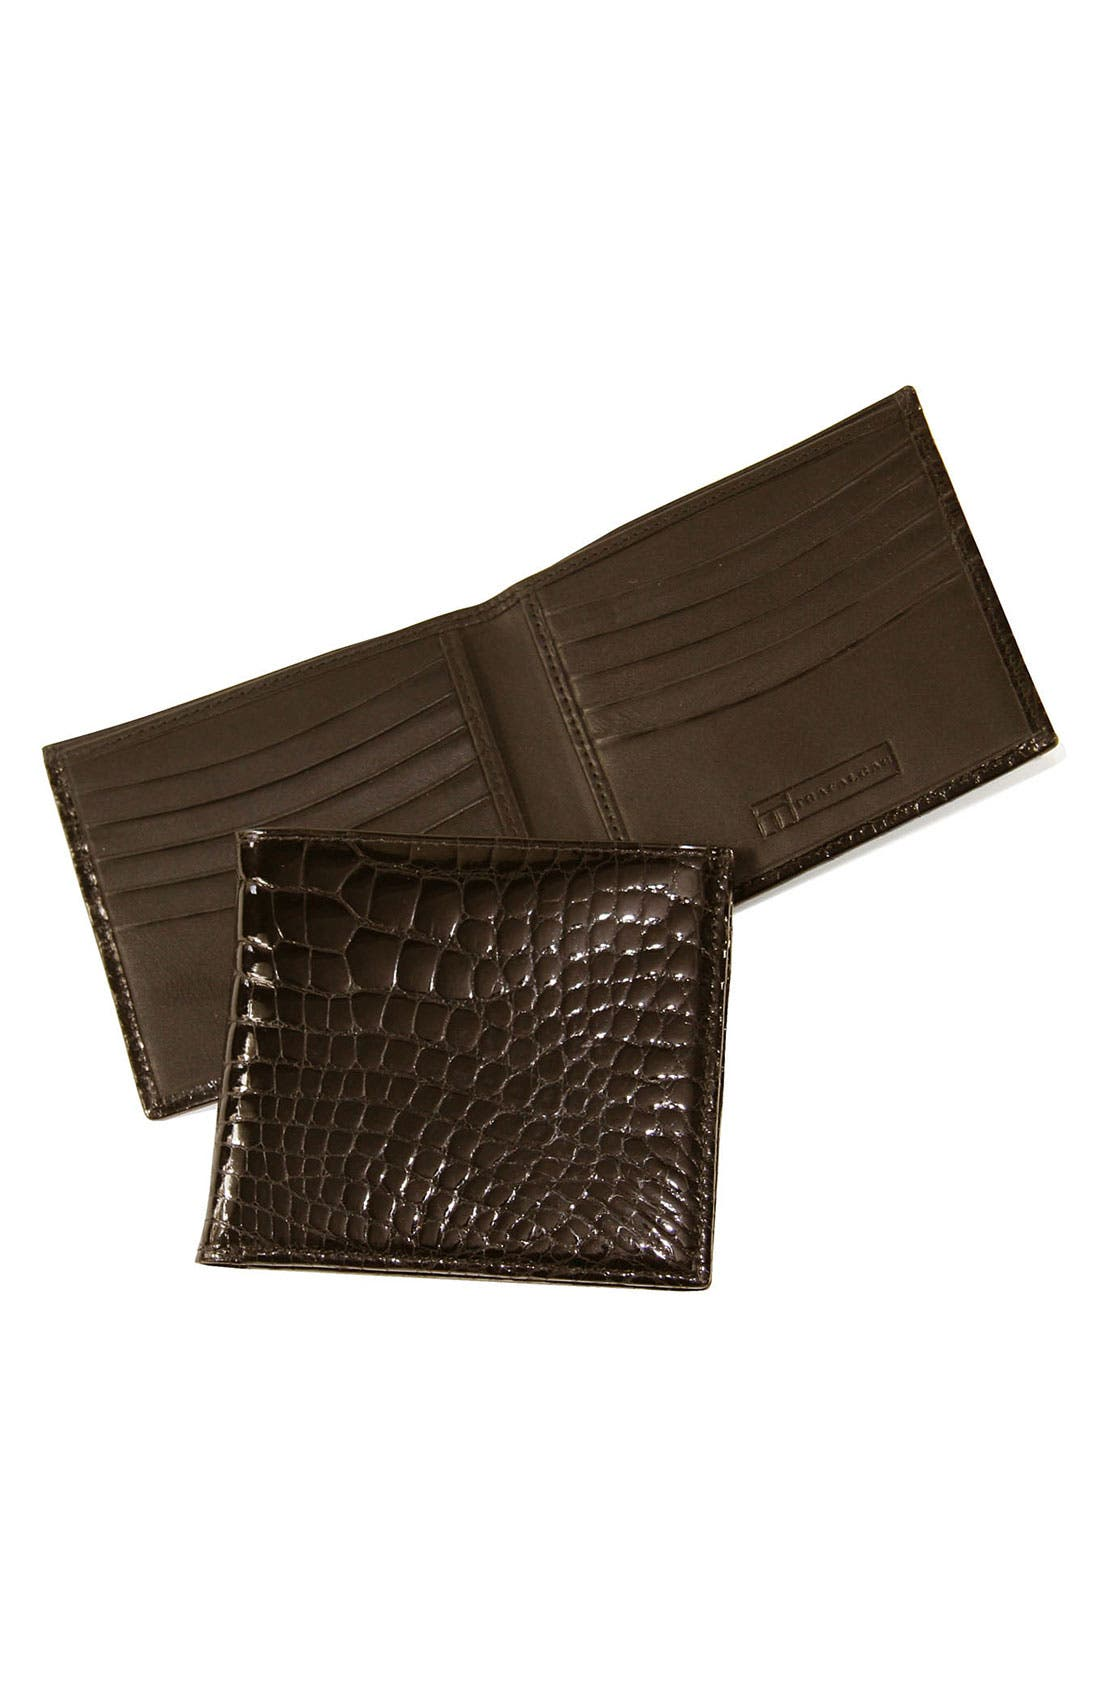 Alternate Image 1 Selected - Trafalgar Genuine Alligator Wallet